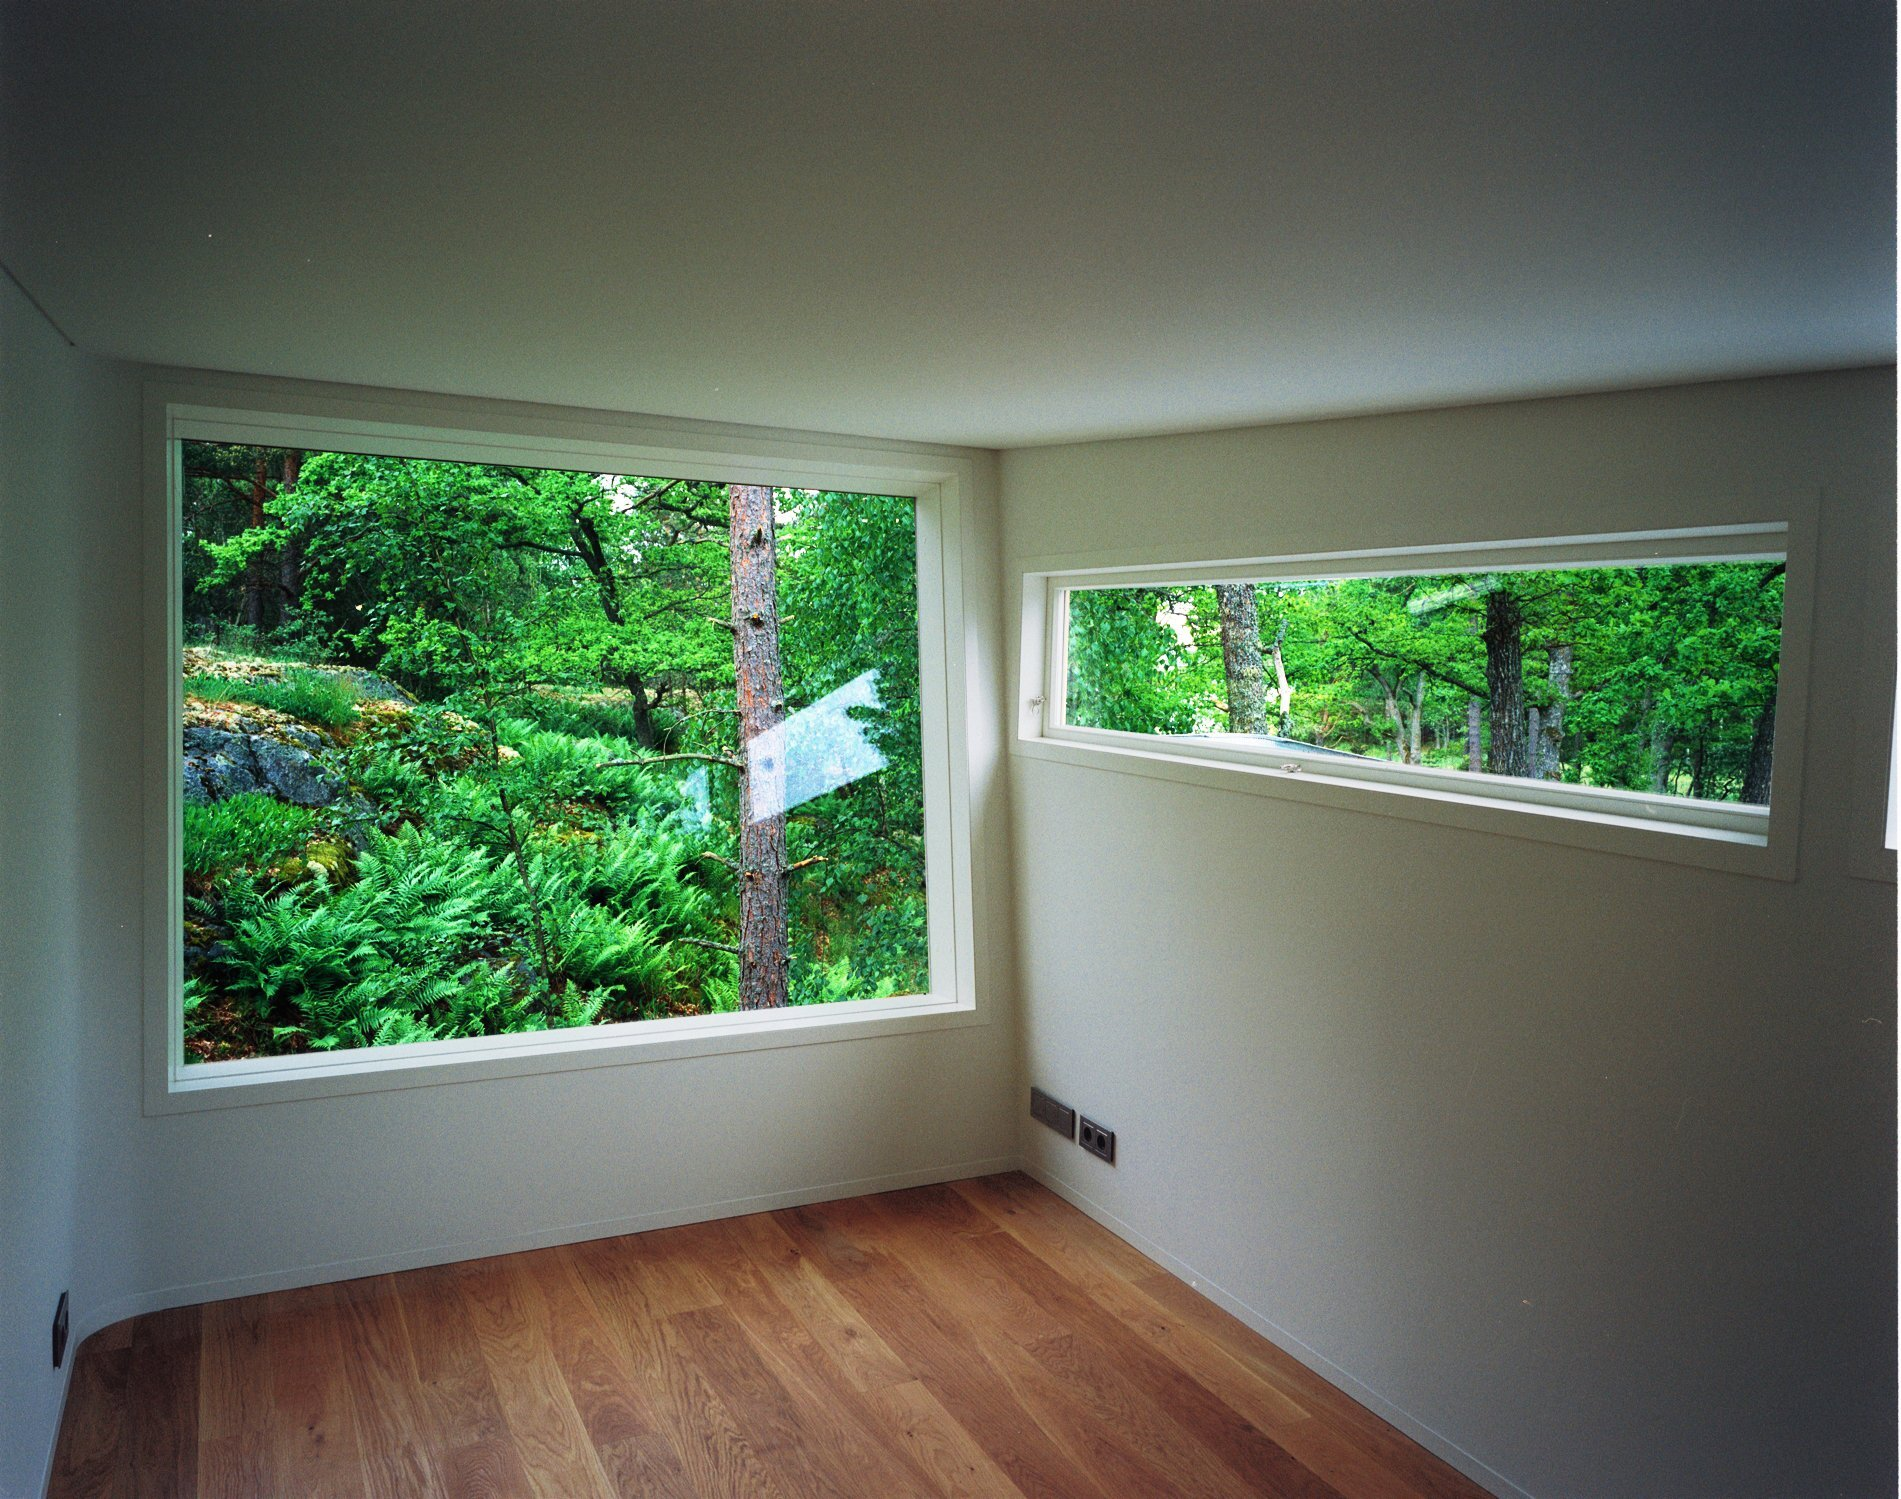 The Wood House - Schlyter + Gezelius Arkitektkontor - Small House - Sweden - Loft - Humble Homes